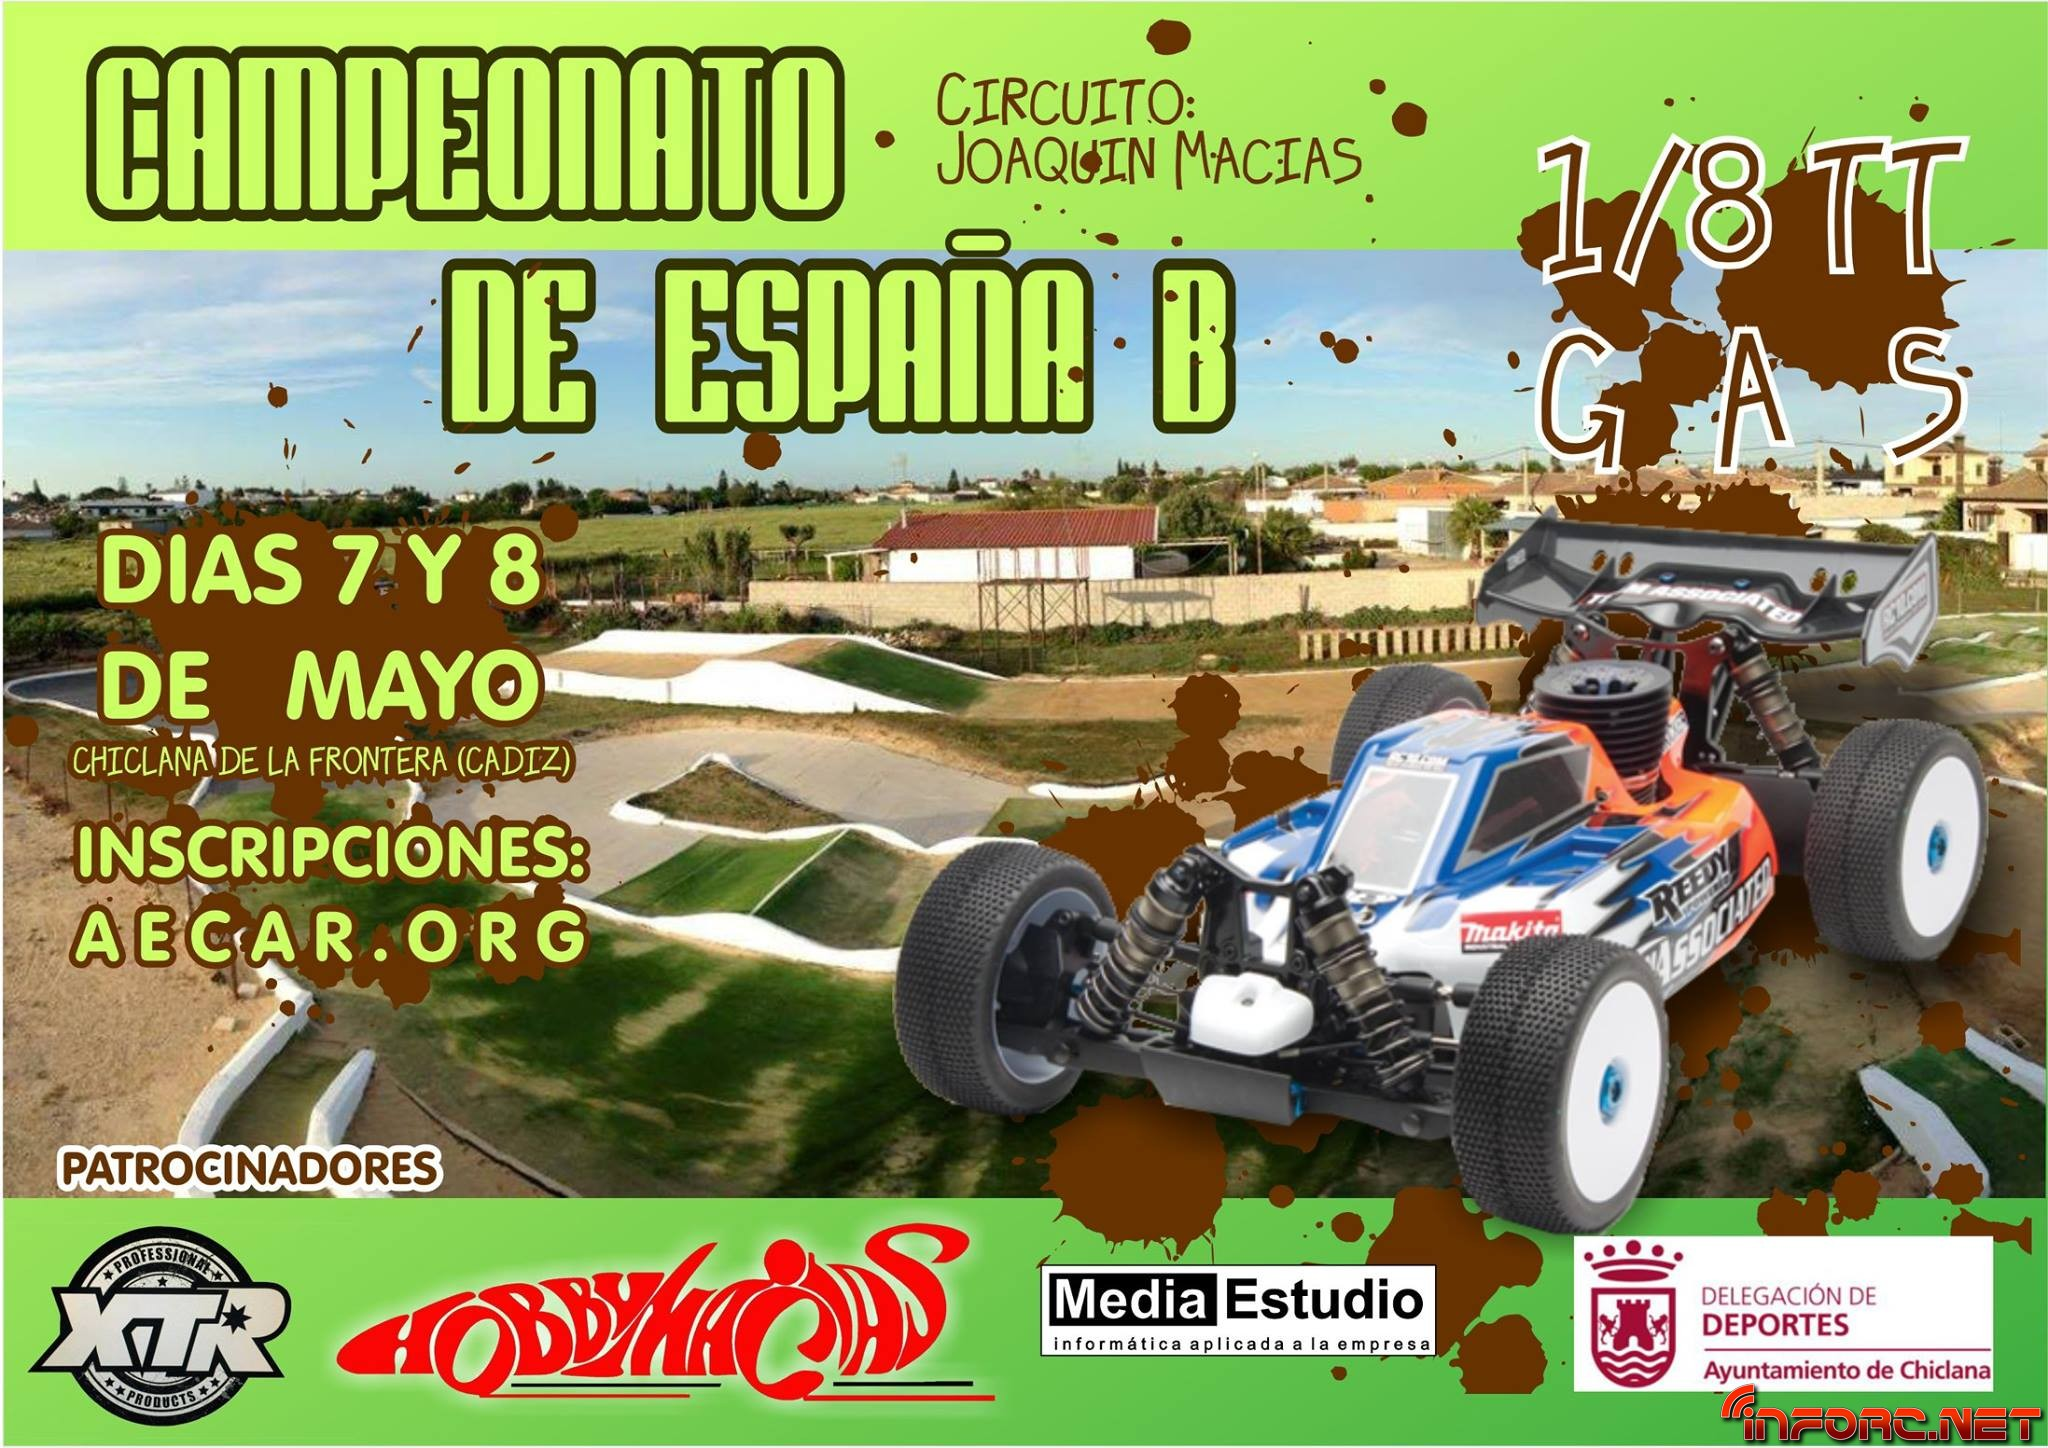 campeonato-espana-b-chiclana